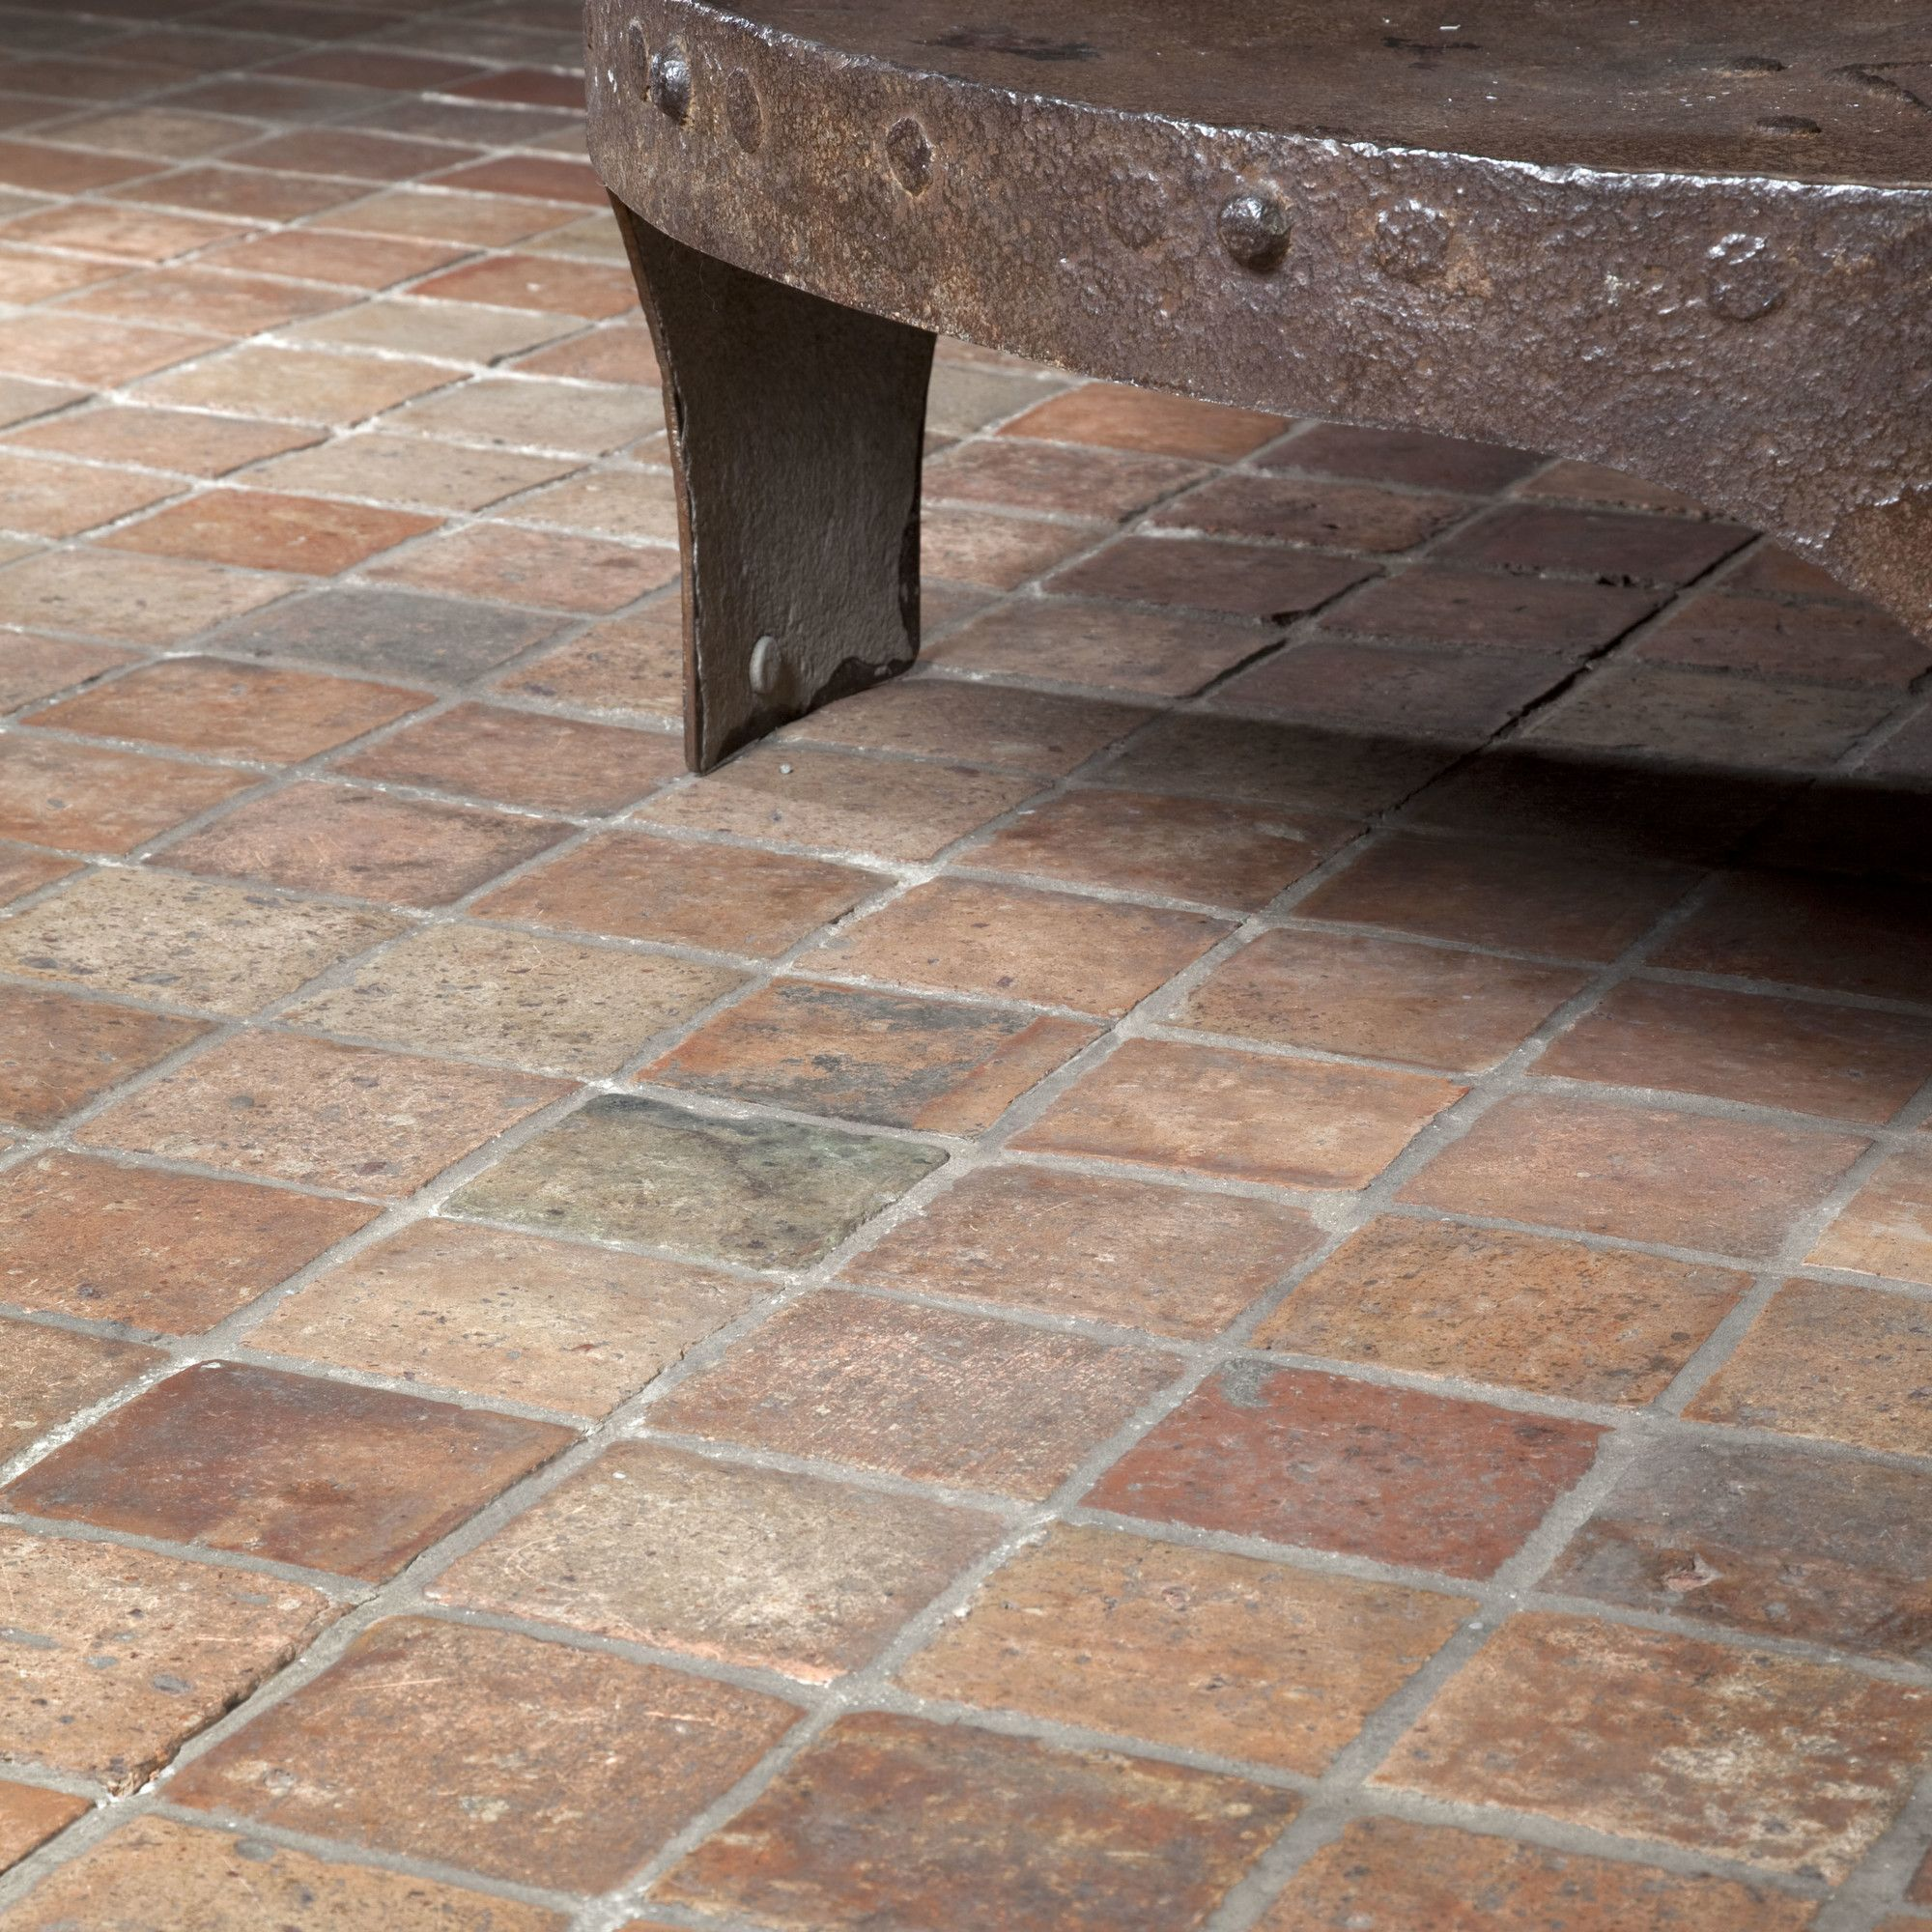 Antike Fliesen In 2020 Antike Fliesen Fliesen Fußboden